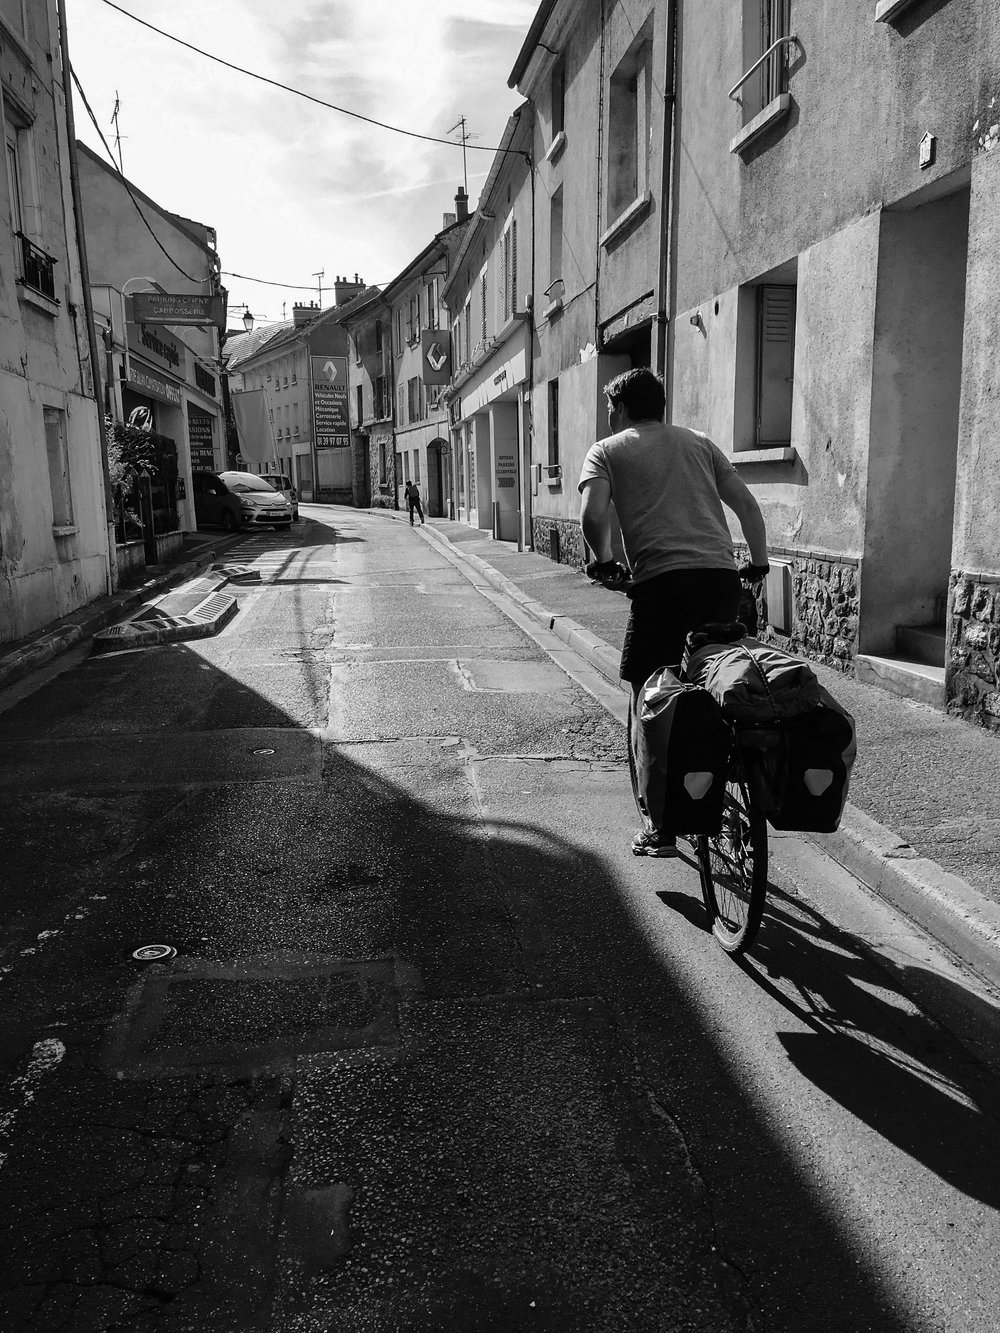 Tom_Oliver_Payne_London_to_Paris_Cycle-25.jpg